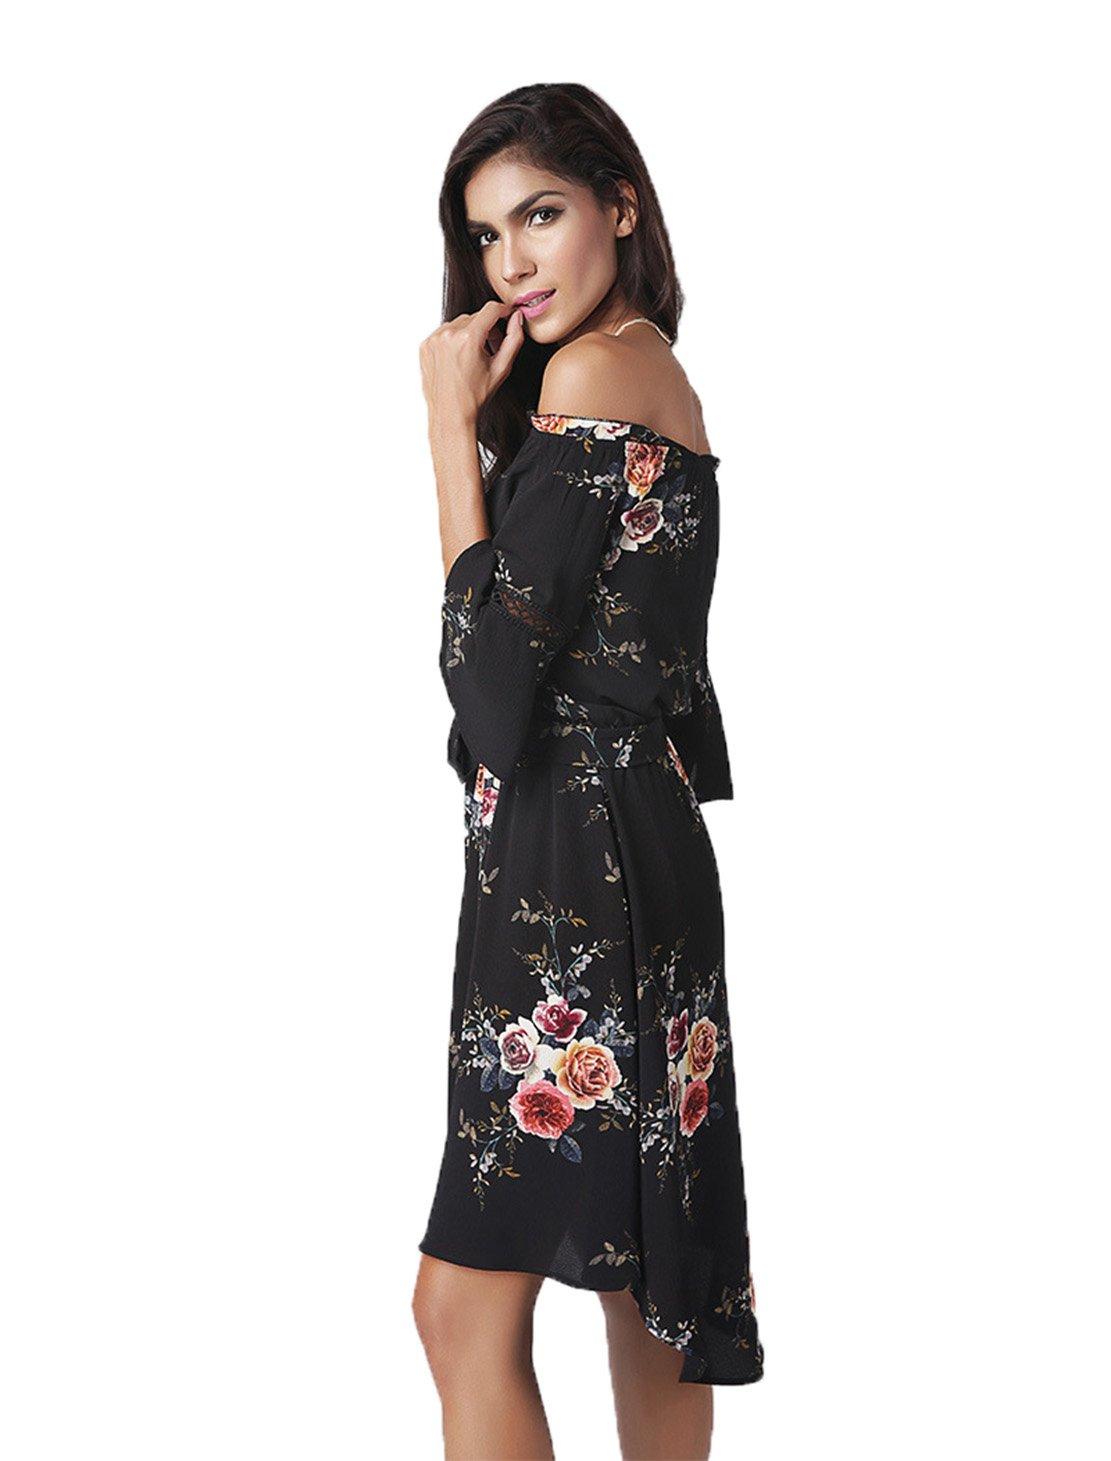 WXW Unregelmäßige Flaches Schulterkleid Schulterkleid Schulterkleid B073Q6MQZN Kleider Elegant 0eeaf5